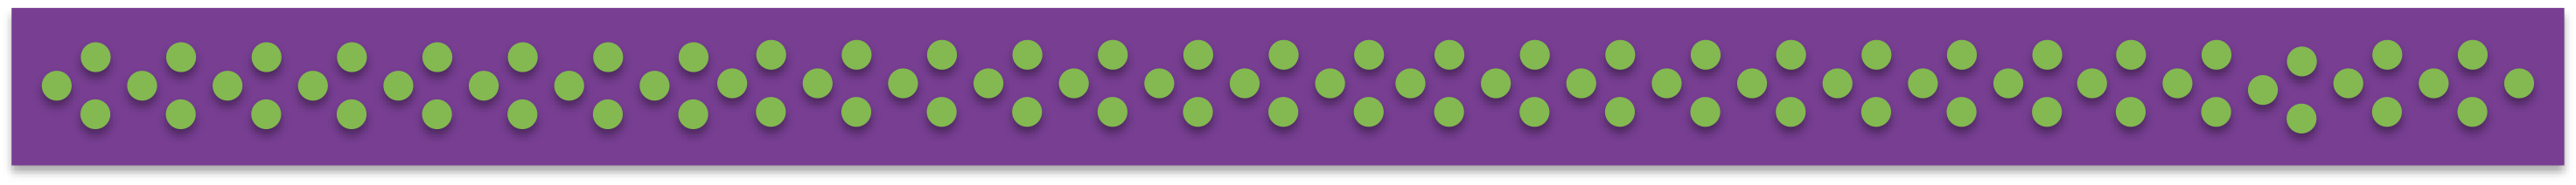 nd-polka-dot-banner.png